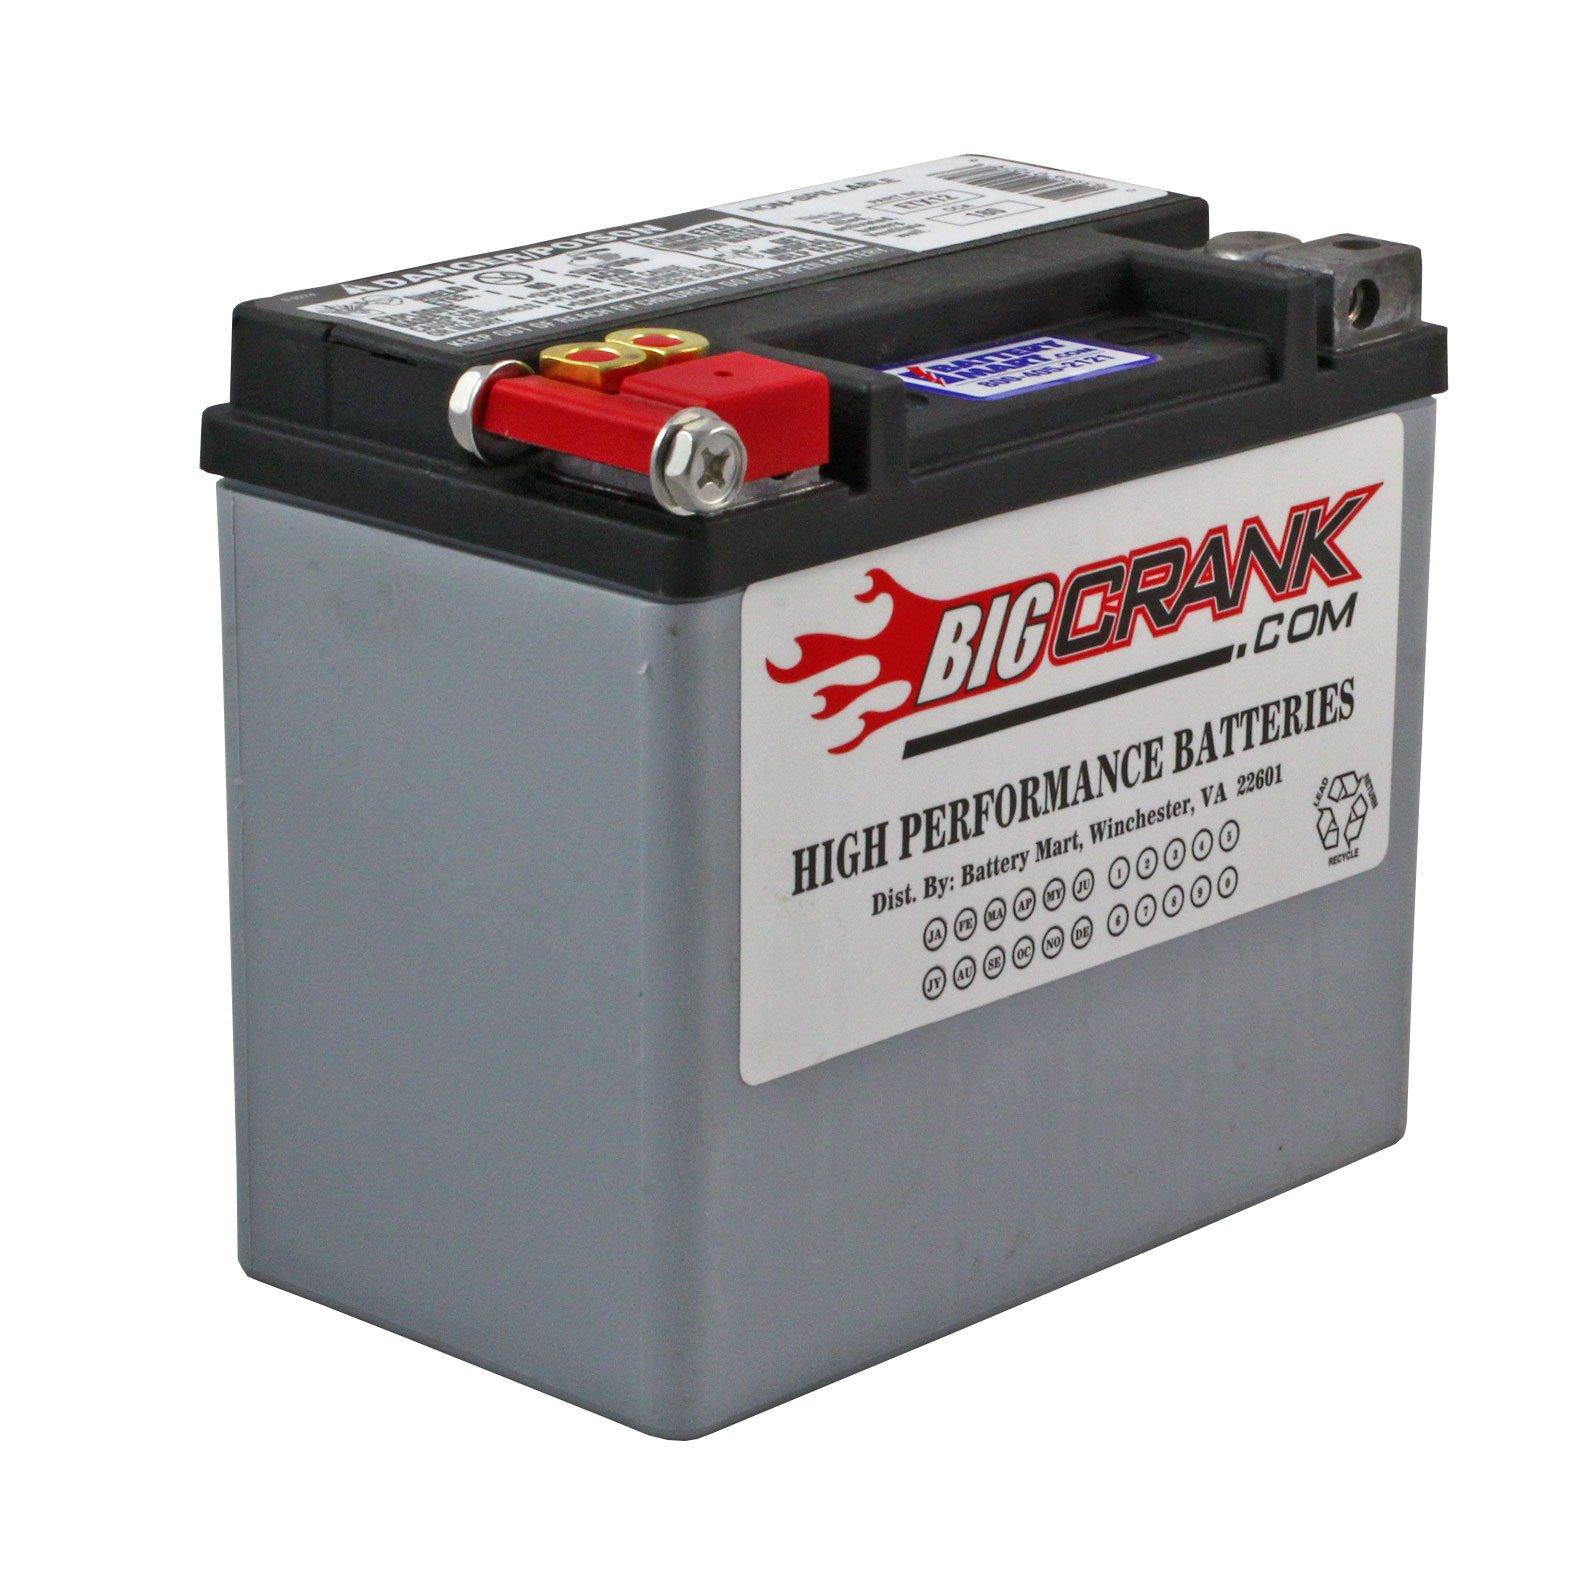 Usa made big crank etx12 battery